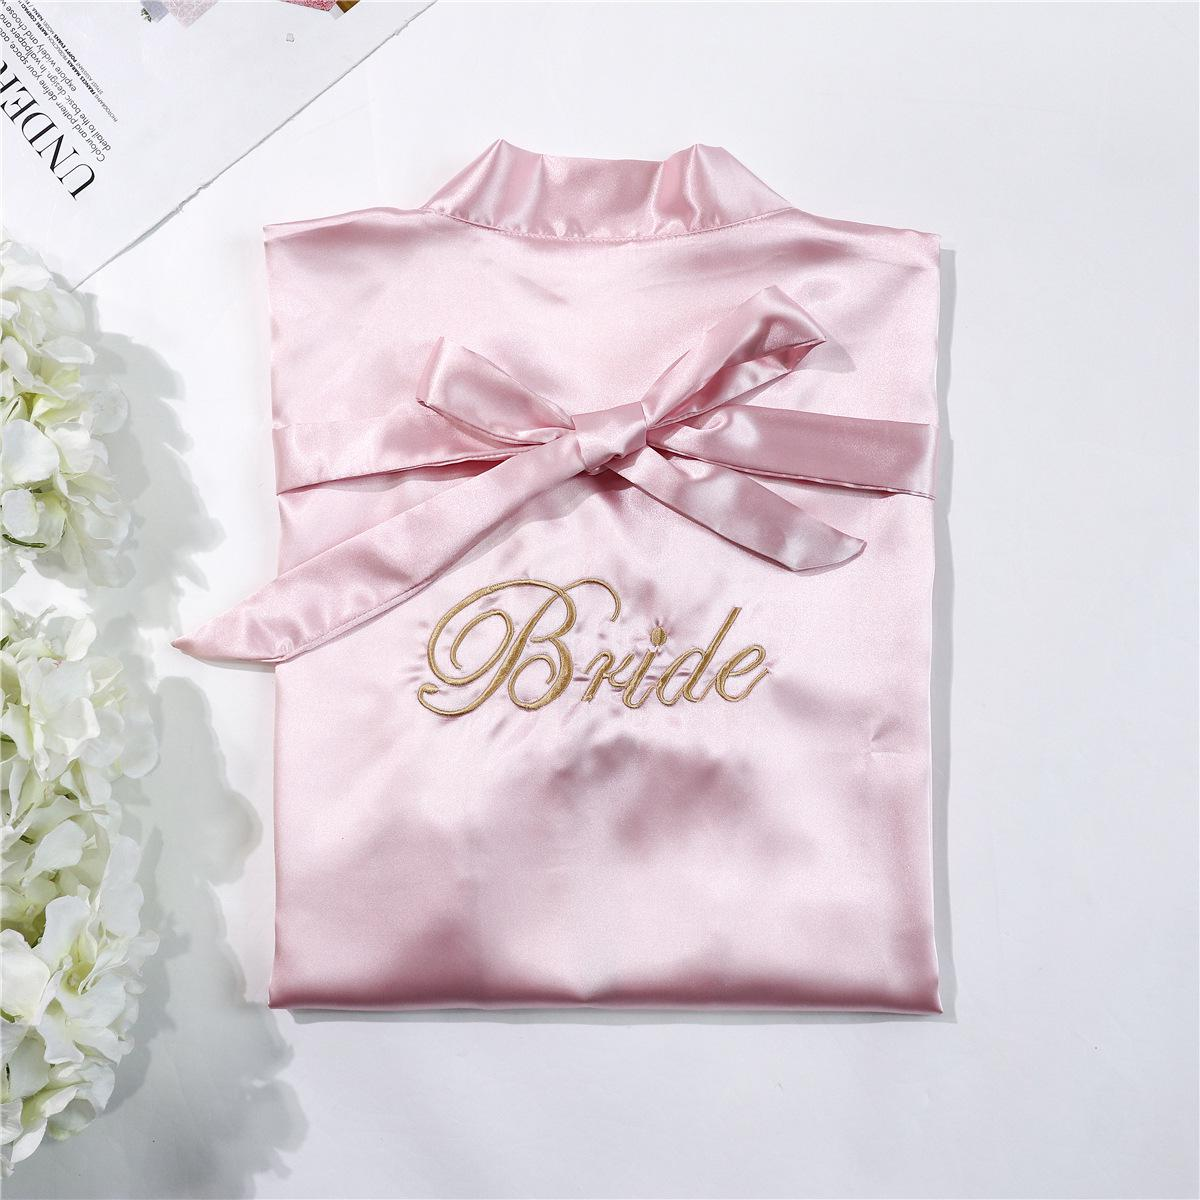 Bride - pink